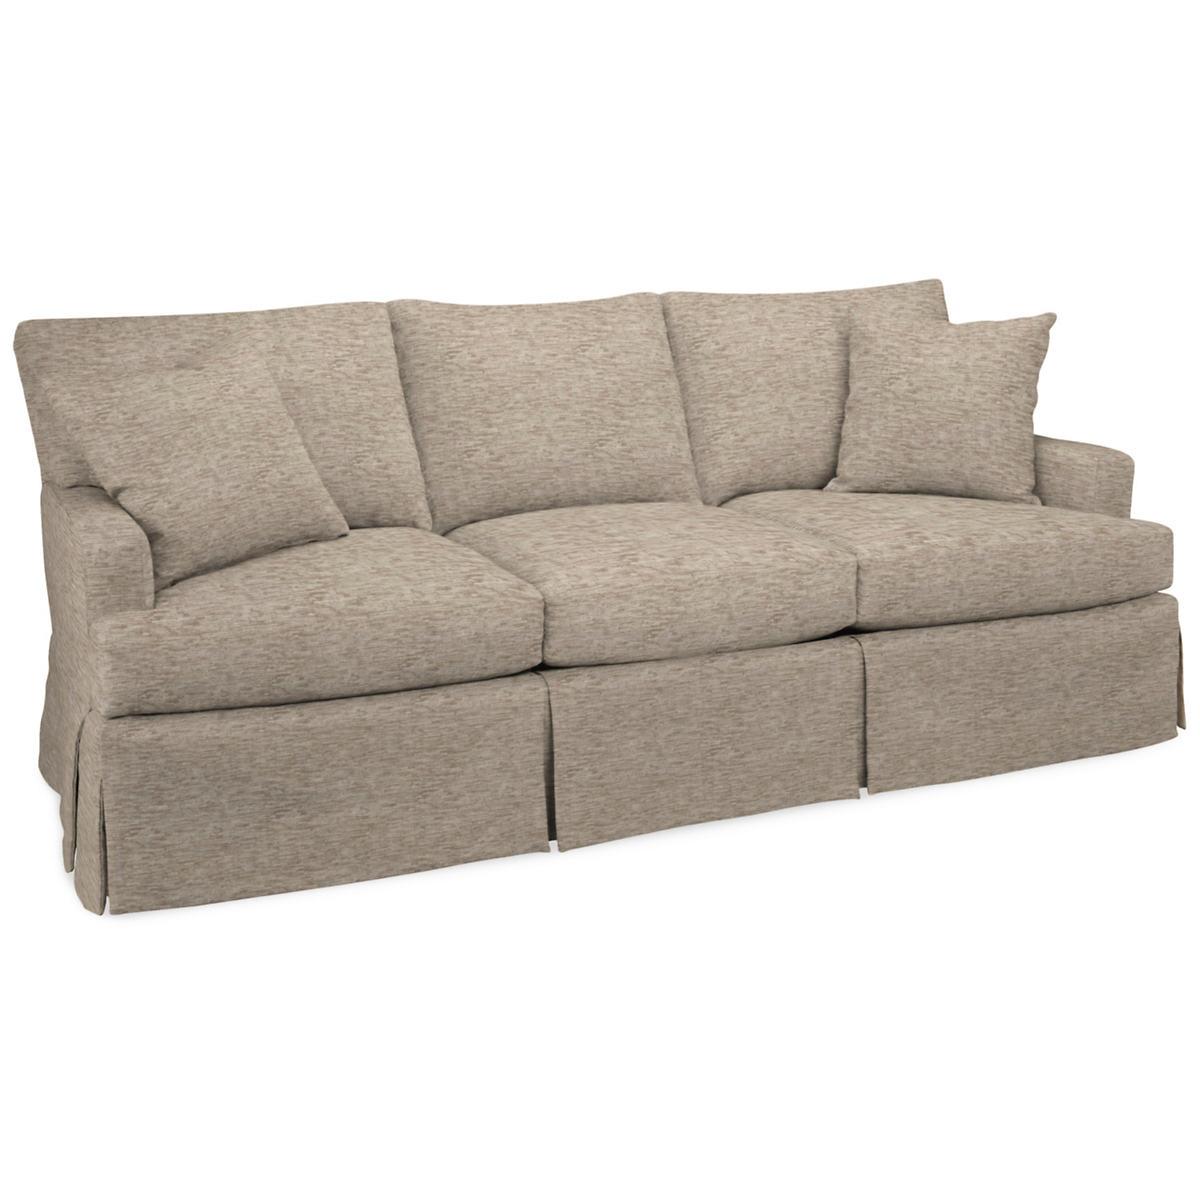 Bark Velvet Stone Saybrook 3 Seater Sofa